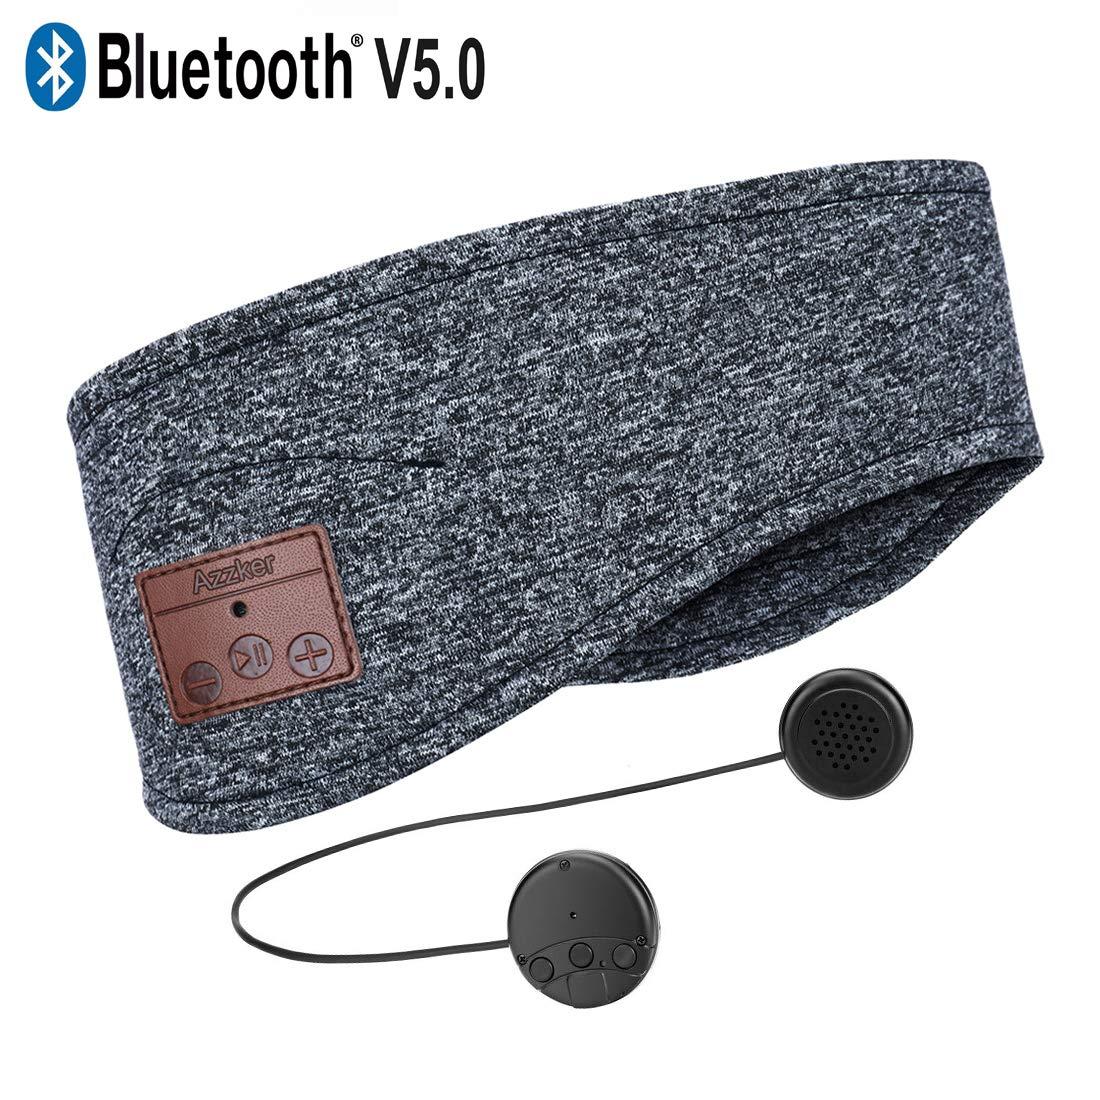 Bluetooth Headband, Azzker Bluetooth Sleep Headphones Travel Headphones